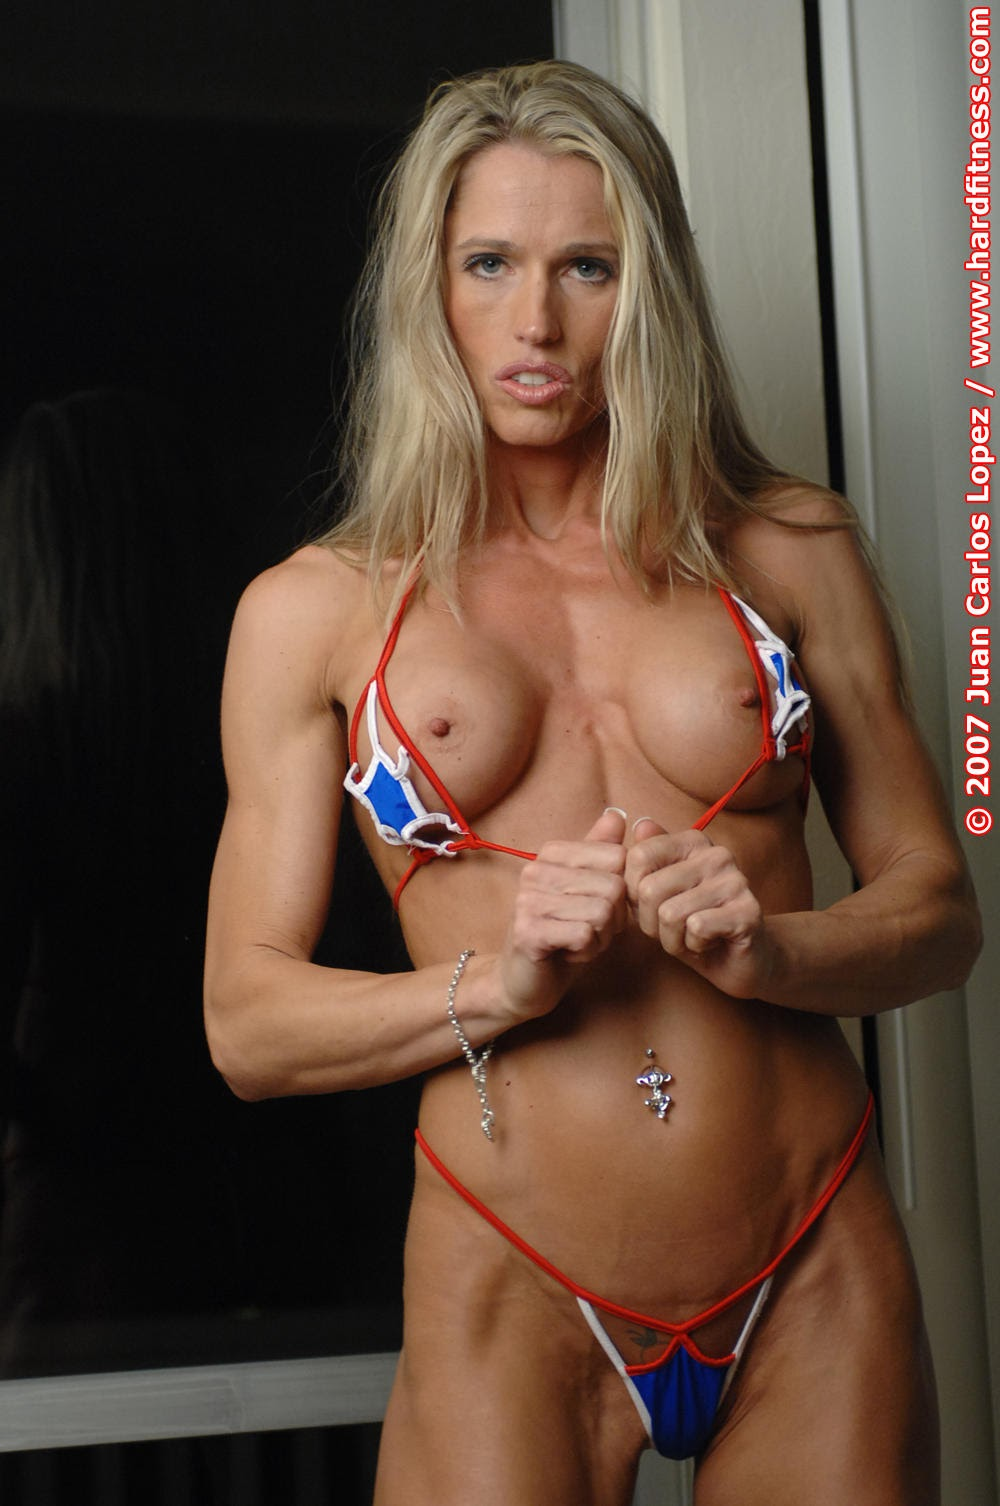 Milf porn muscle blonde